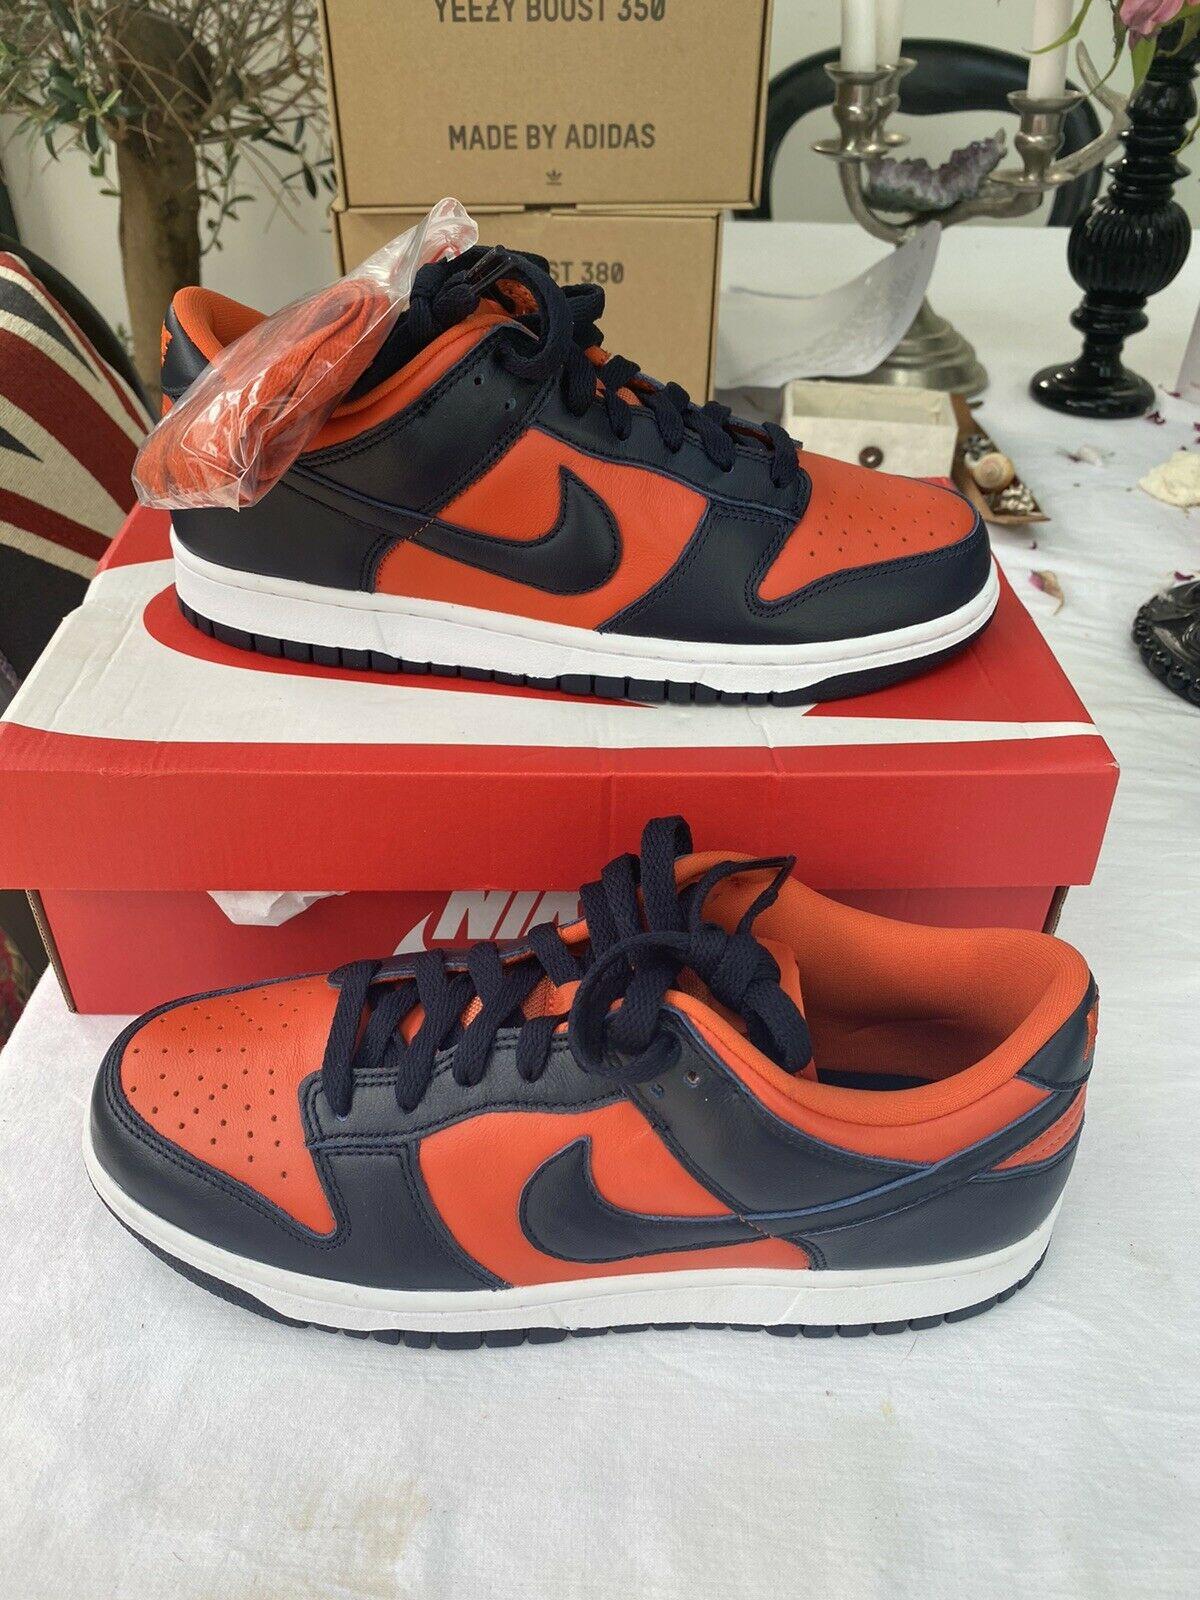 Nike Dunk Low SP Champ Colors University Orange Marine 2020